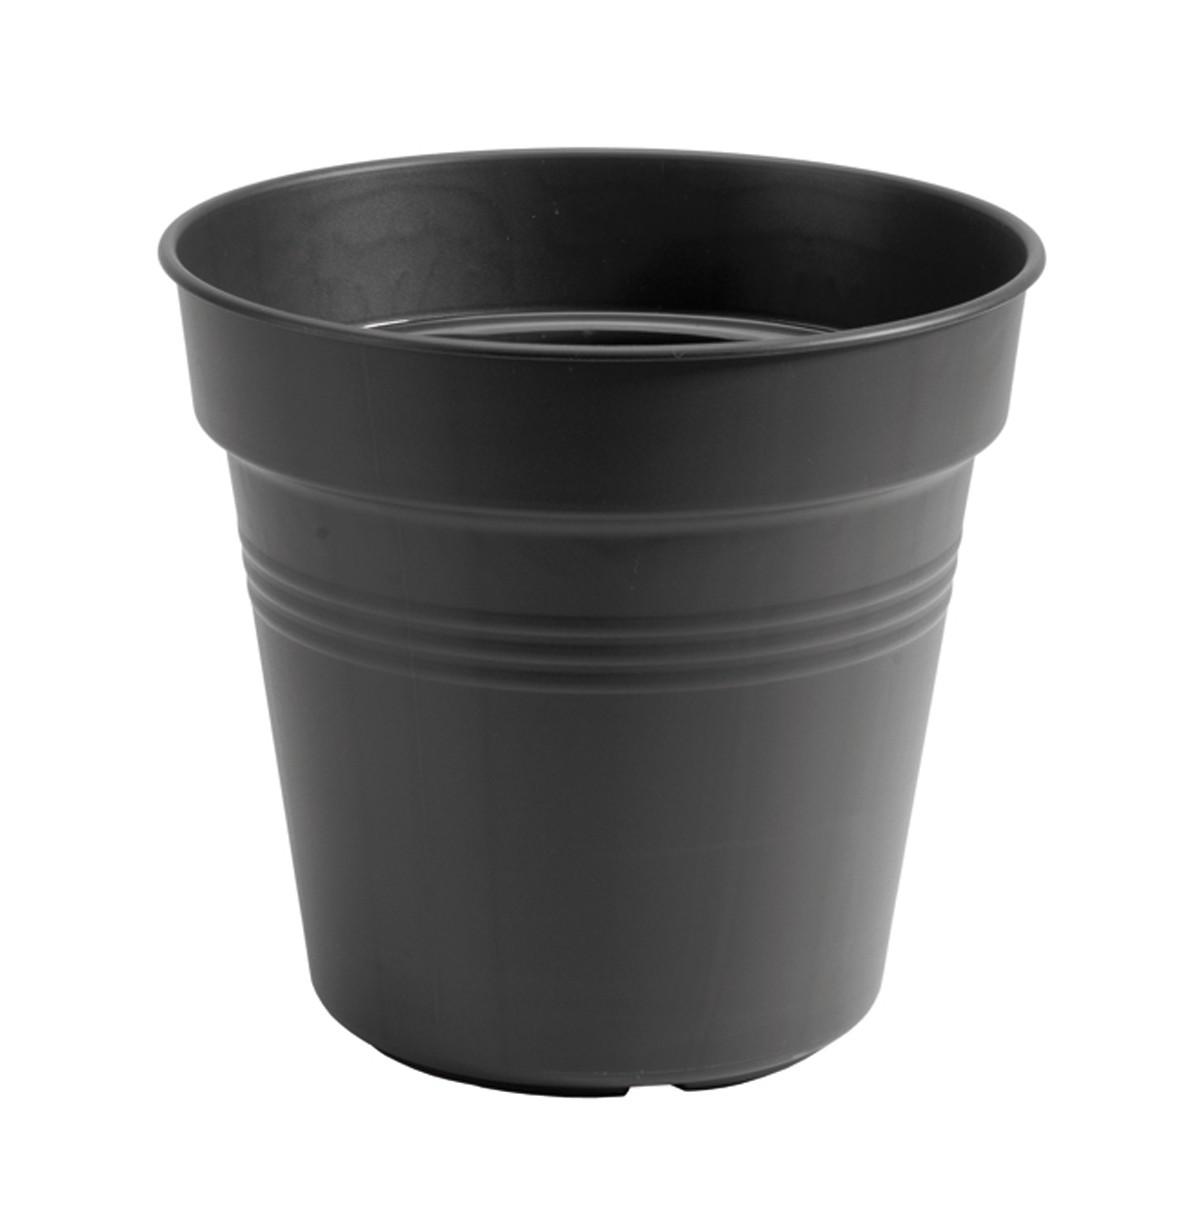 Bloempot Green basics kweekpot 27 cm living black elho